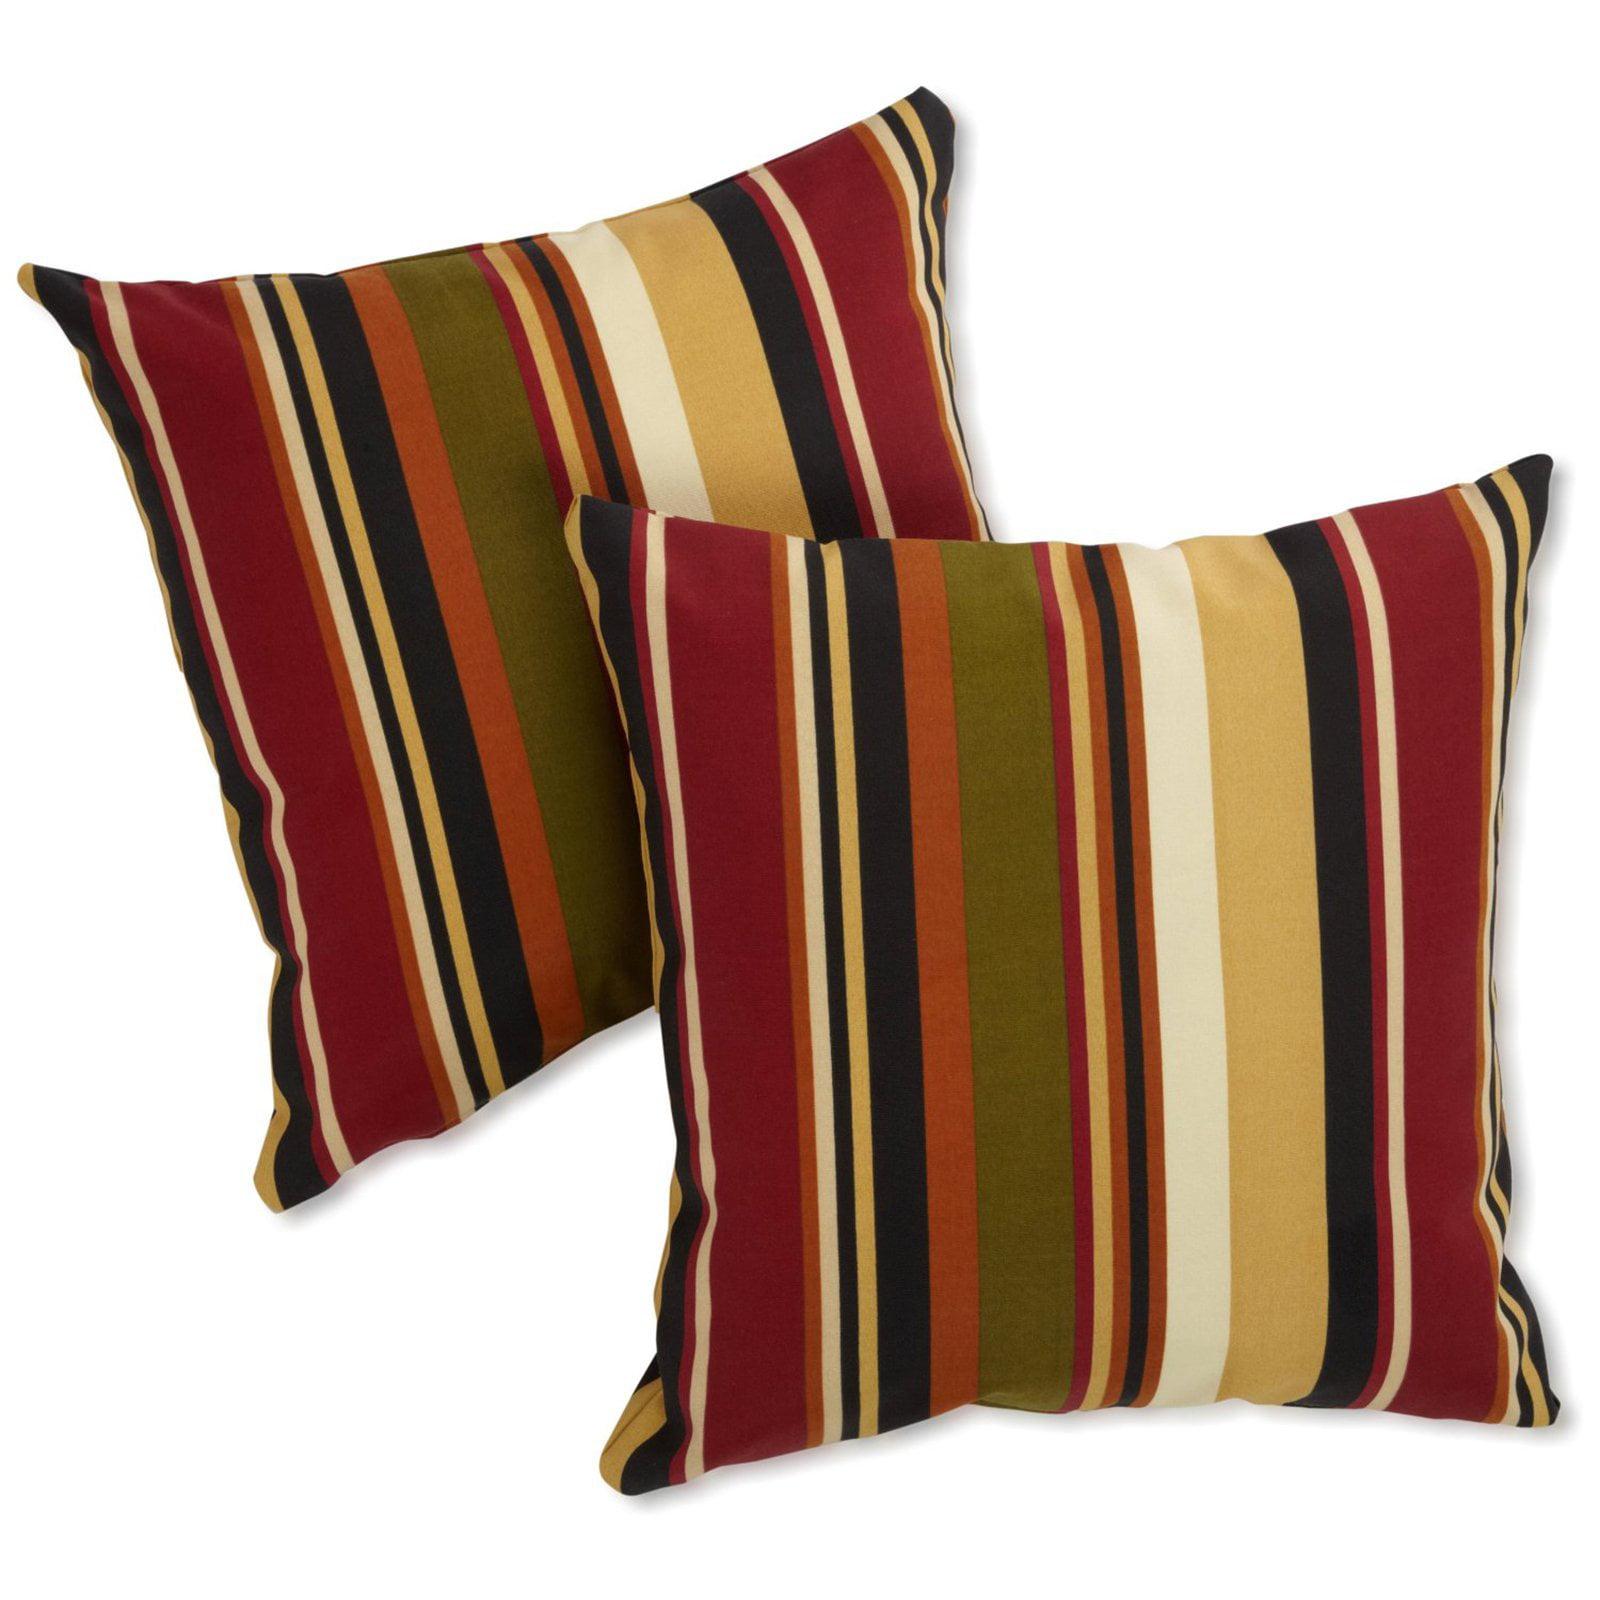 Blazing Needles 25 X 25 In Jumbo Outdoor Throw Pillows Set Of 2